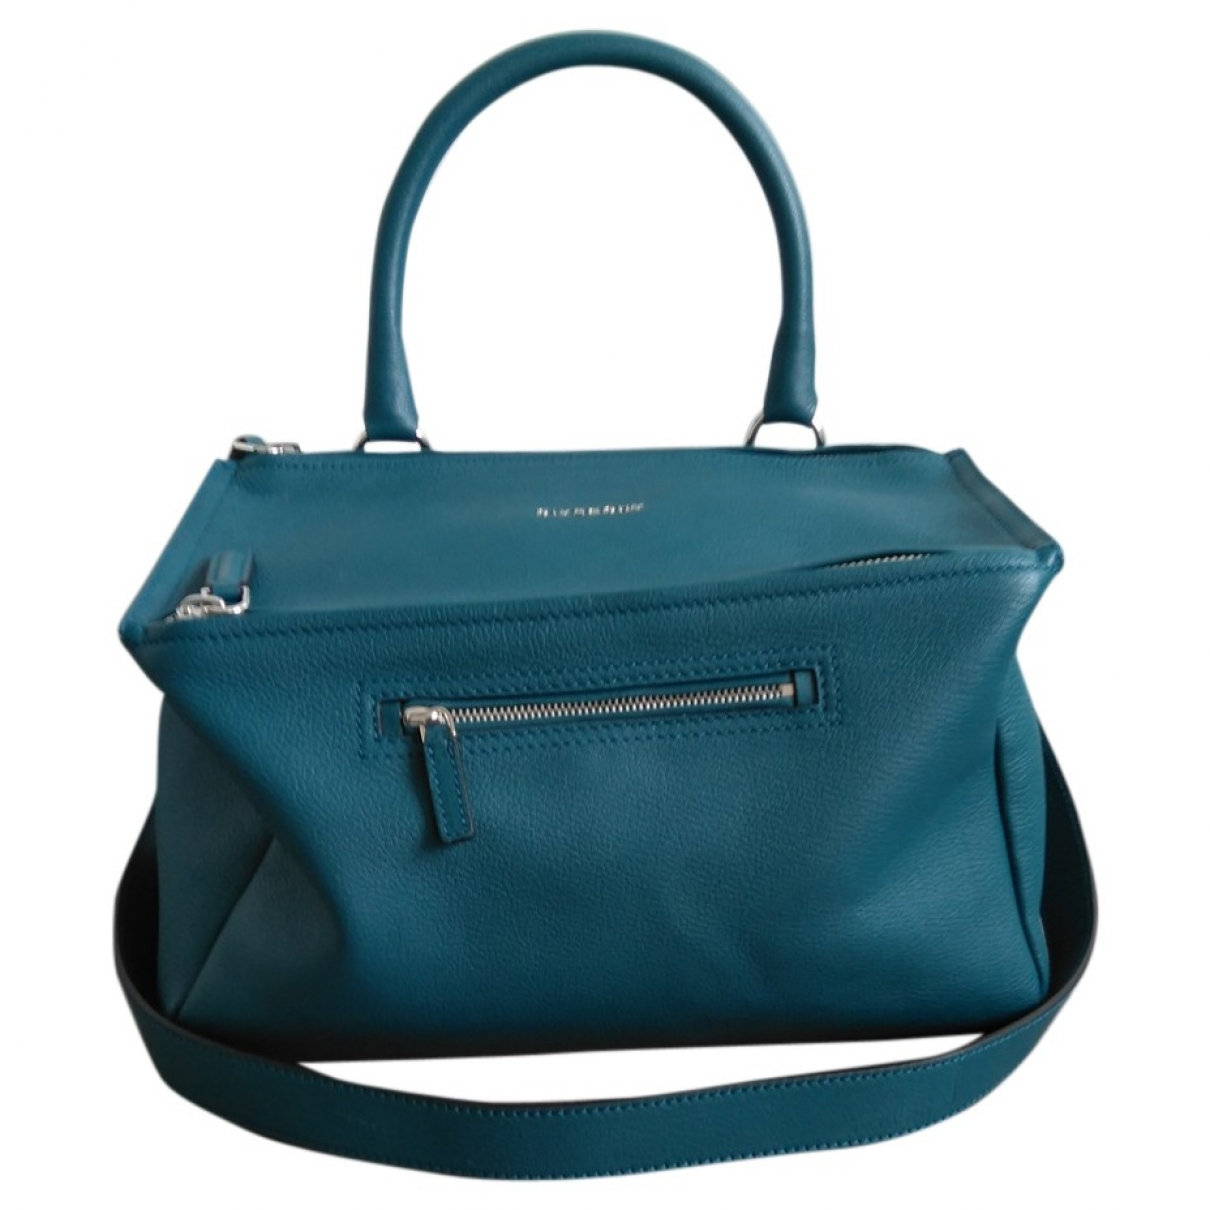 Givenchy Pandora Turquoise Leather handbag for Women \N